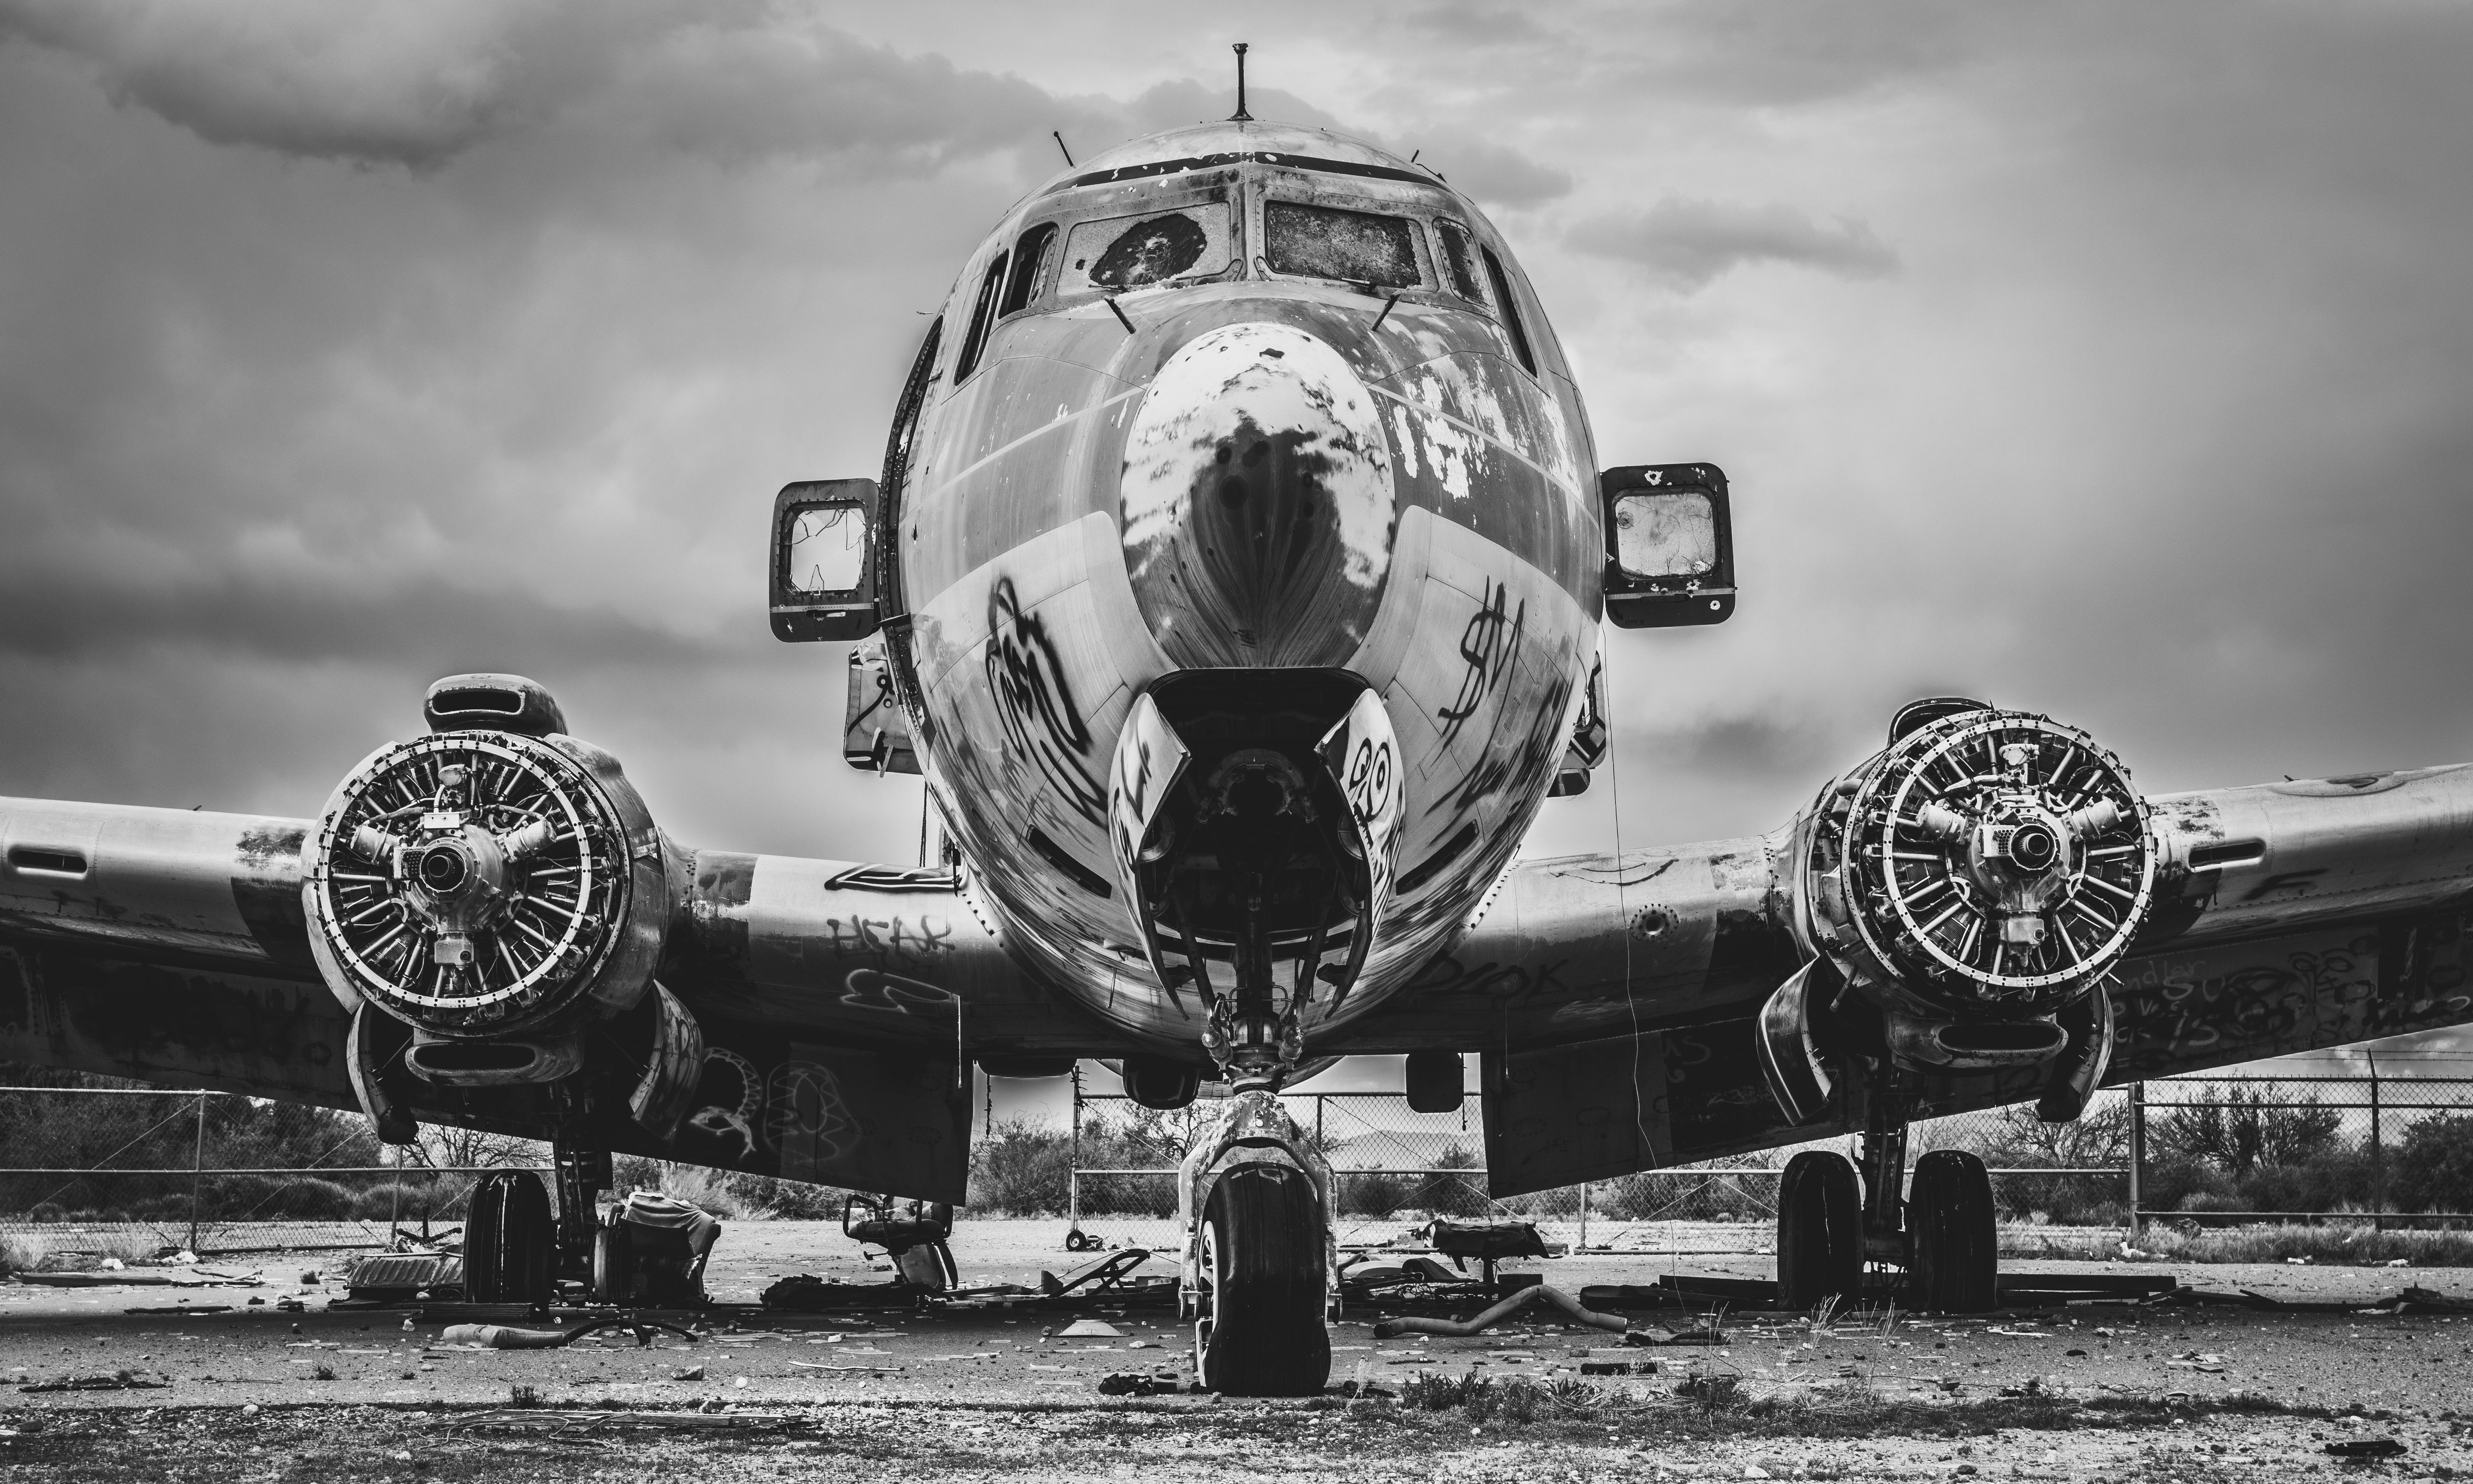 Wallpaper Douglas Dc6 Aircraft Old Airplane Plane